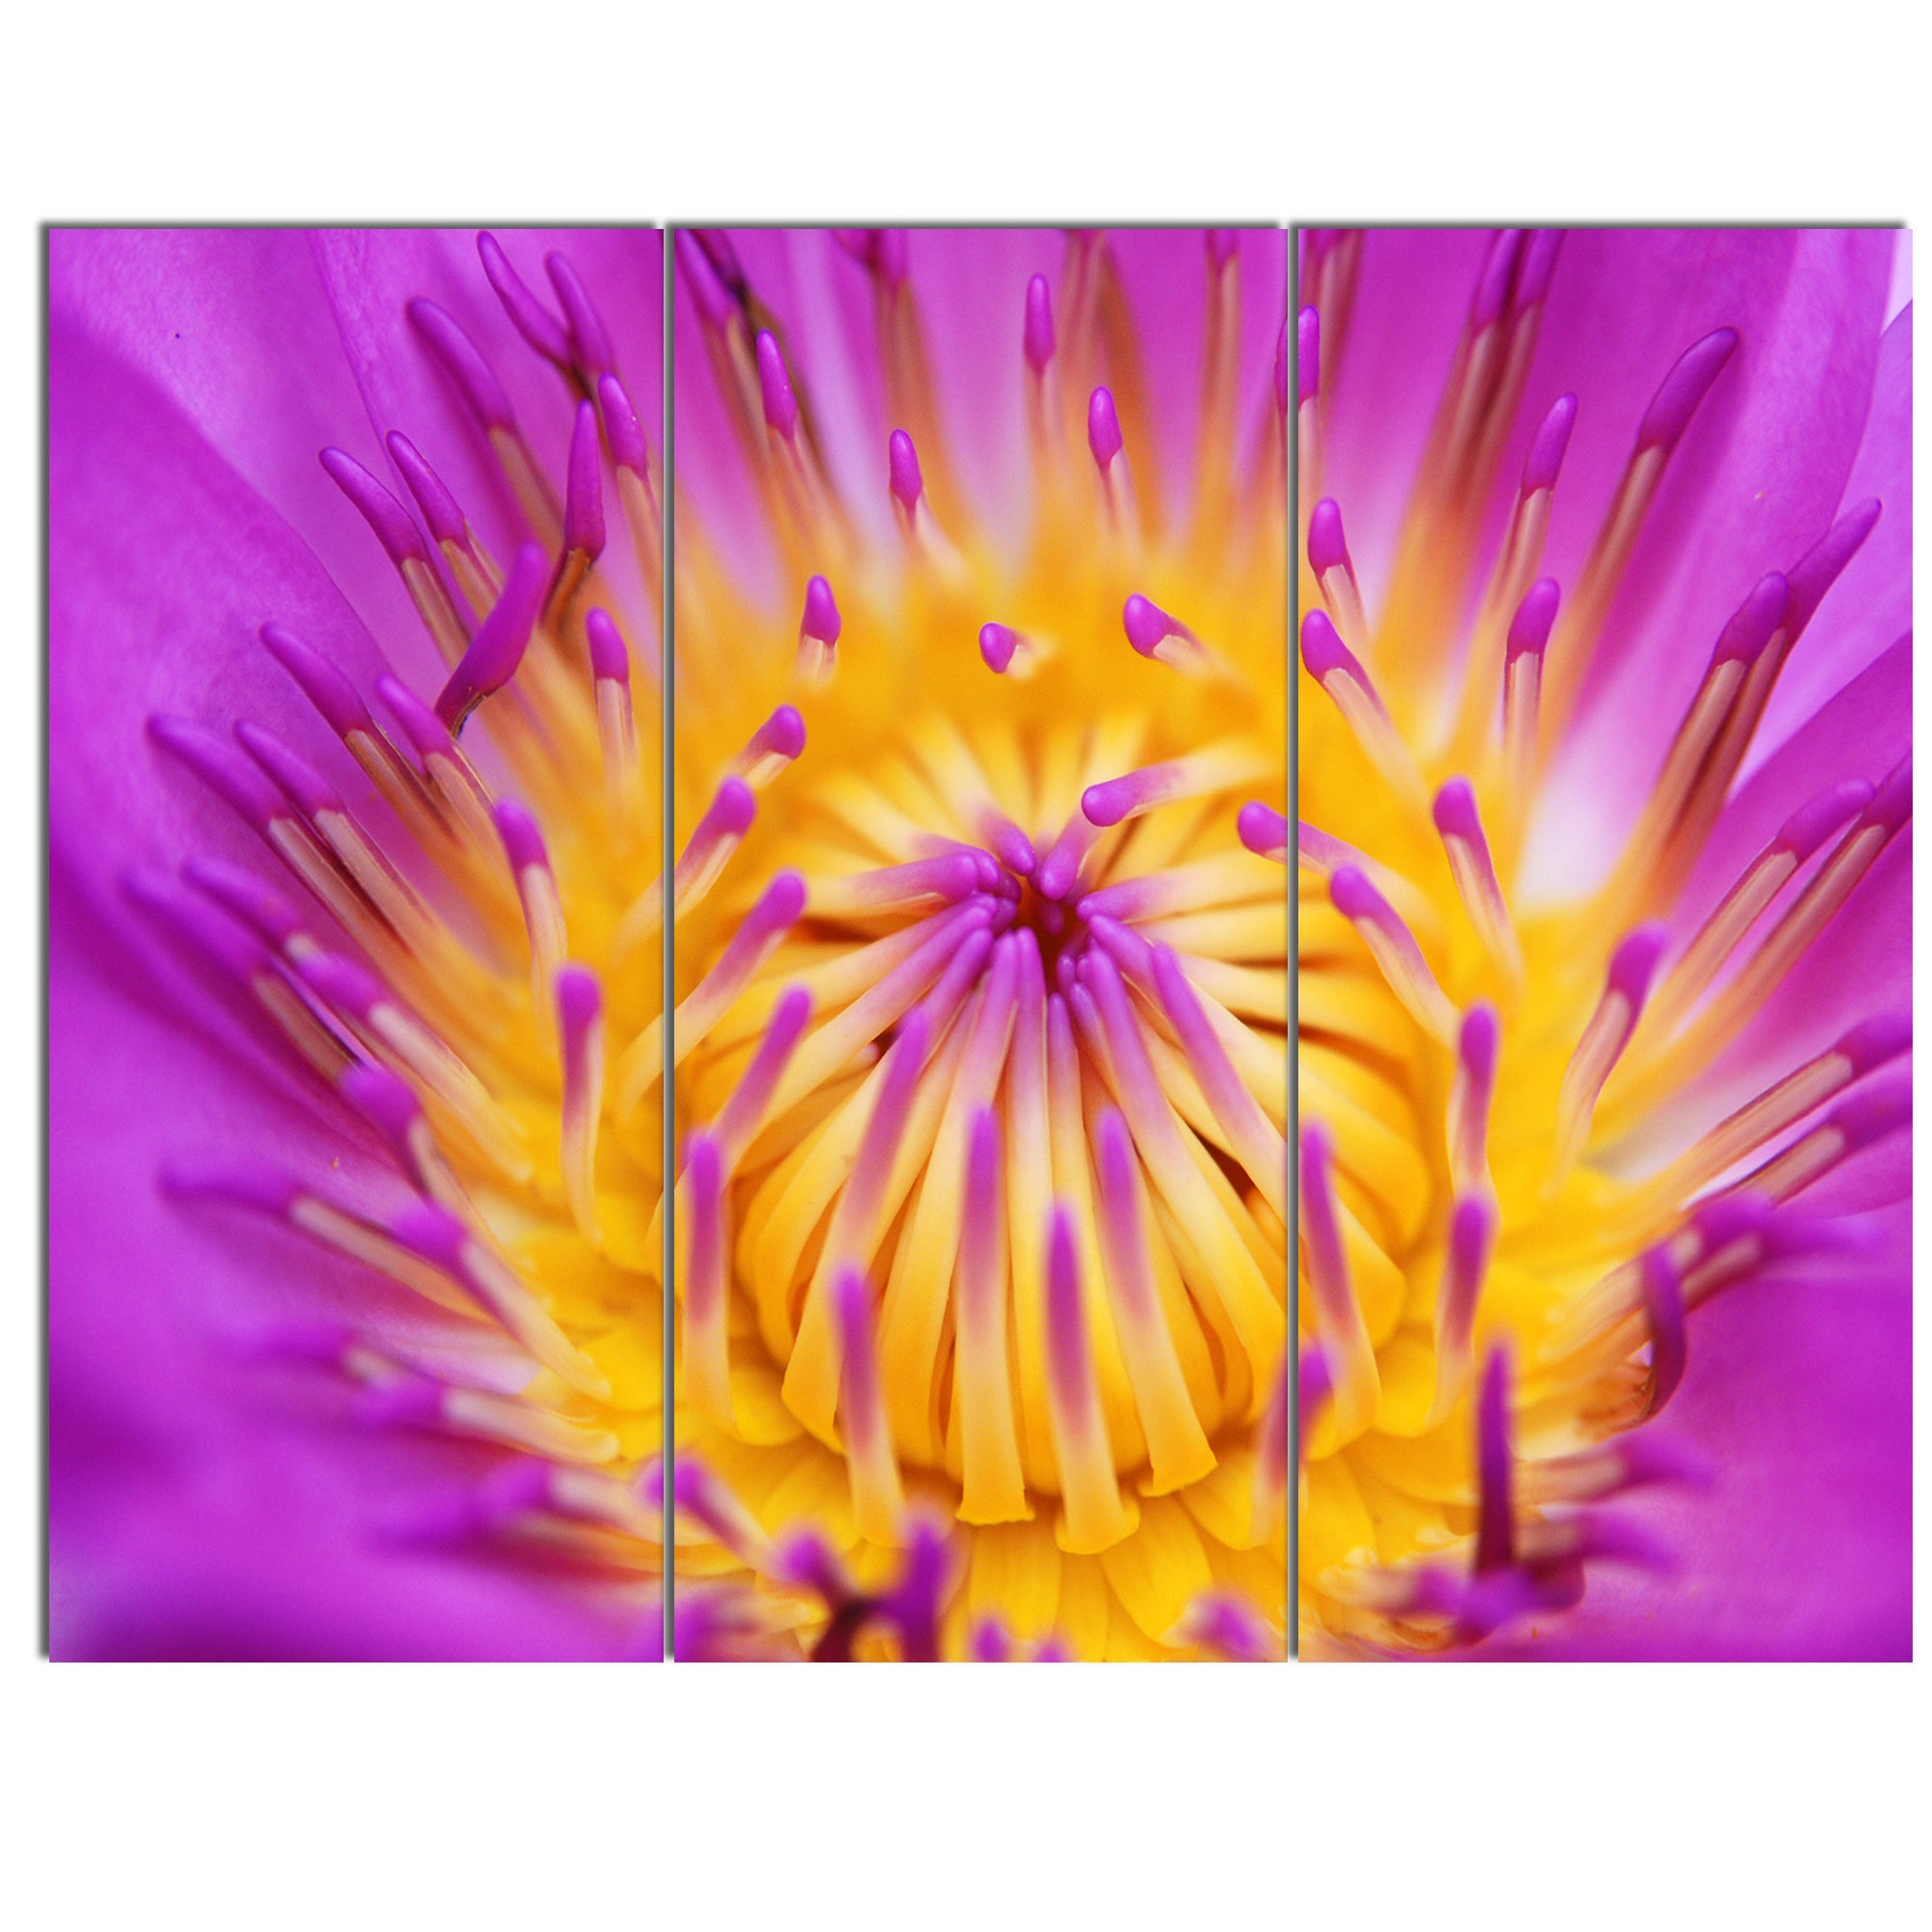 Designart pink yellow abstract lotus flower flowers canvas wall designart pink yellow abstract lotus flower flowers canvas wall artwork free shipping today overstock 20208788 izmirmasajfo